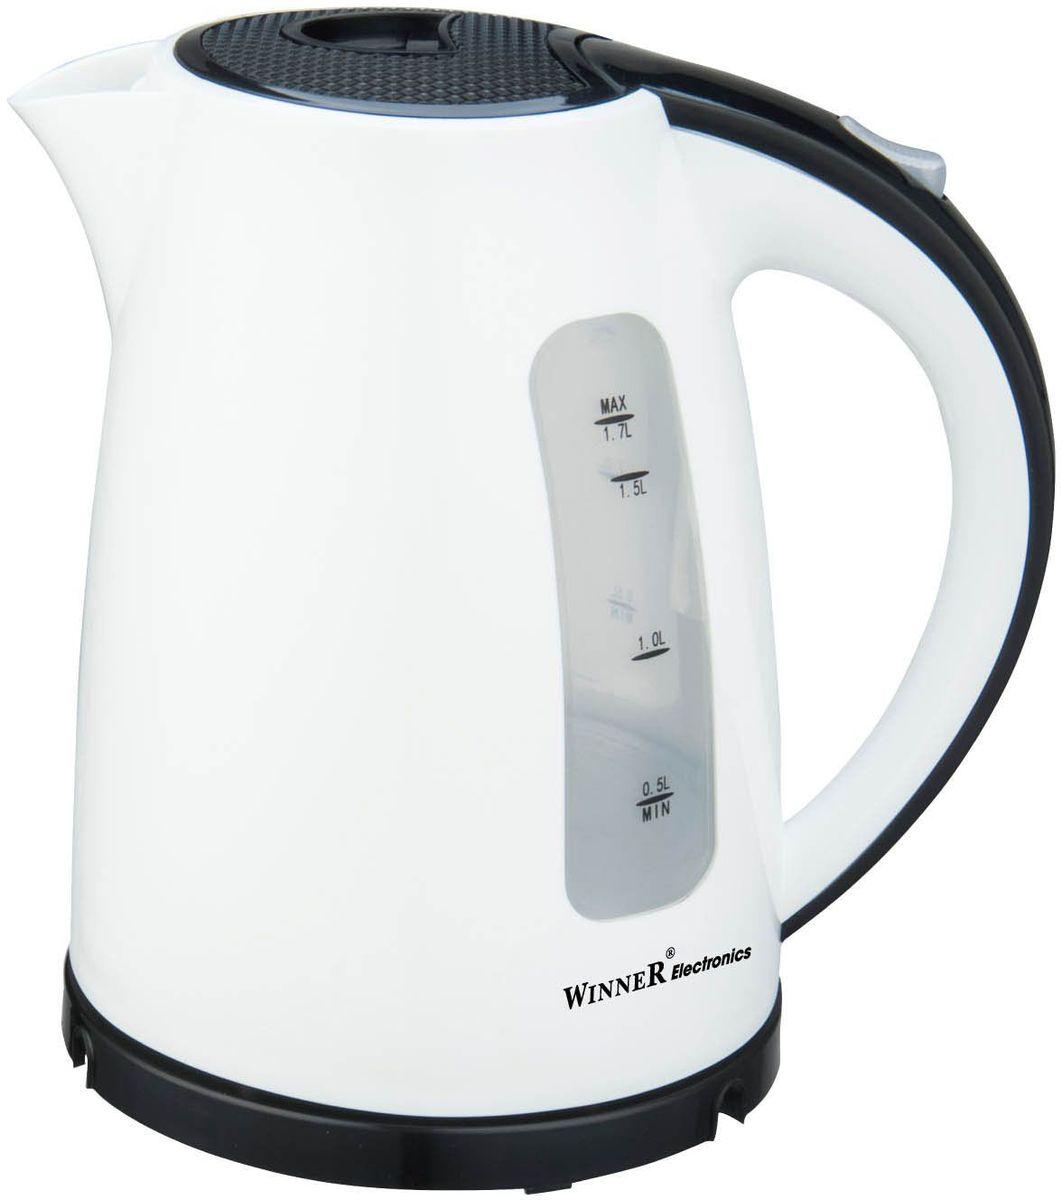 Winner Electronics WR-123 электрический чайник